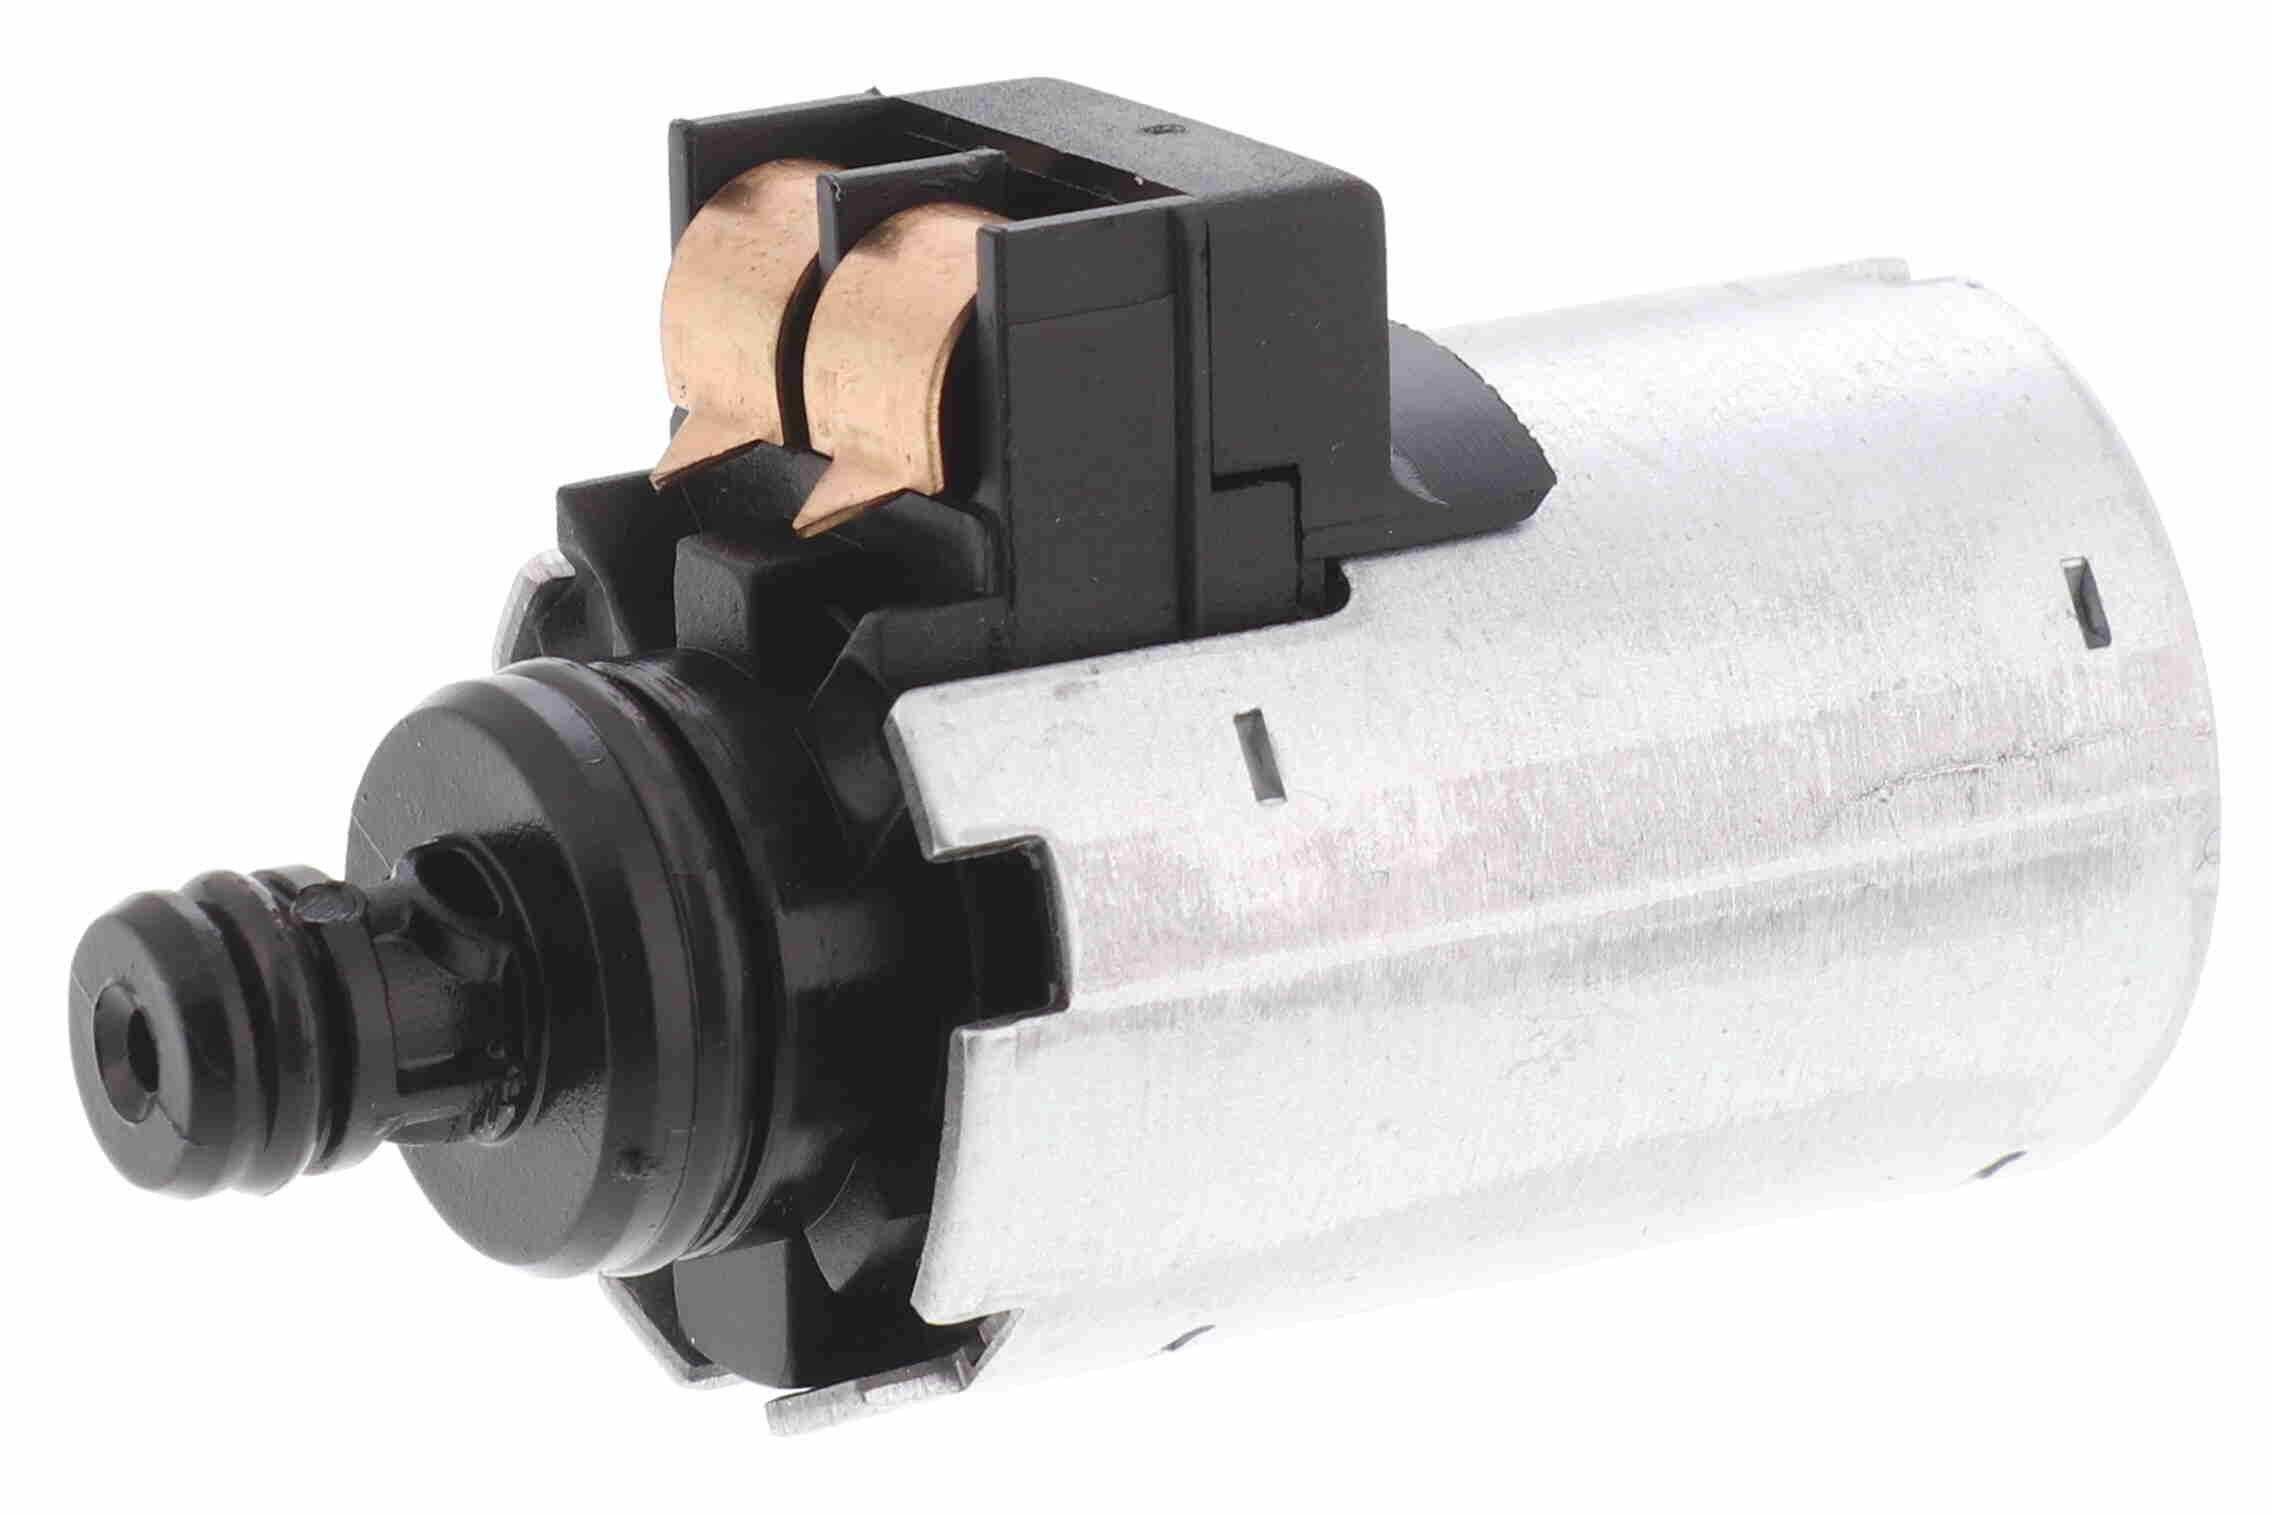 MERCEDES-BENZ E-Klasse 2012 Schaltventil, Automatikgetriebe - Original VEMO V30-77-0041